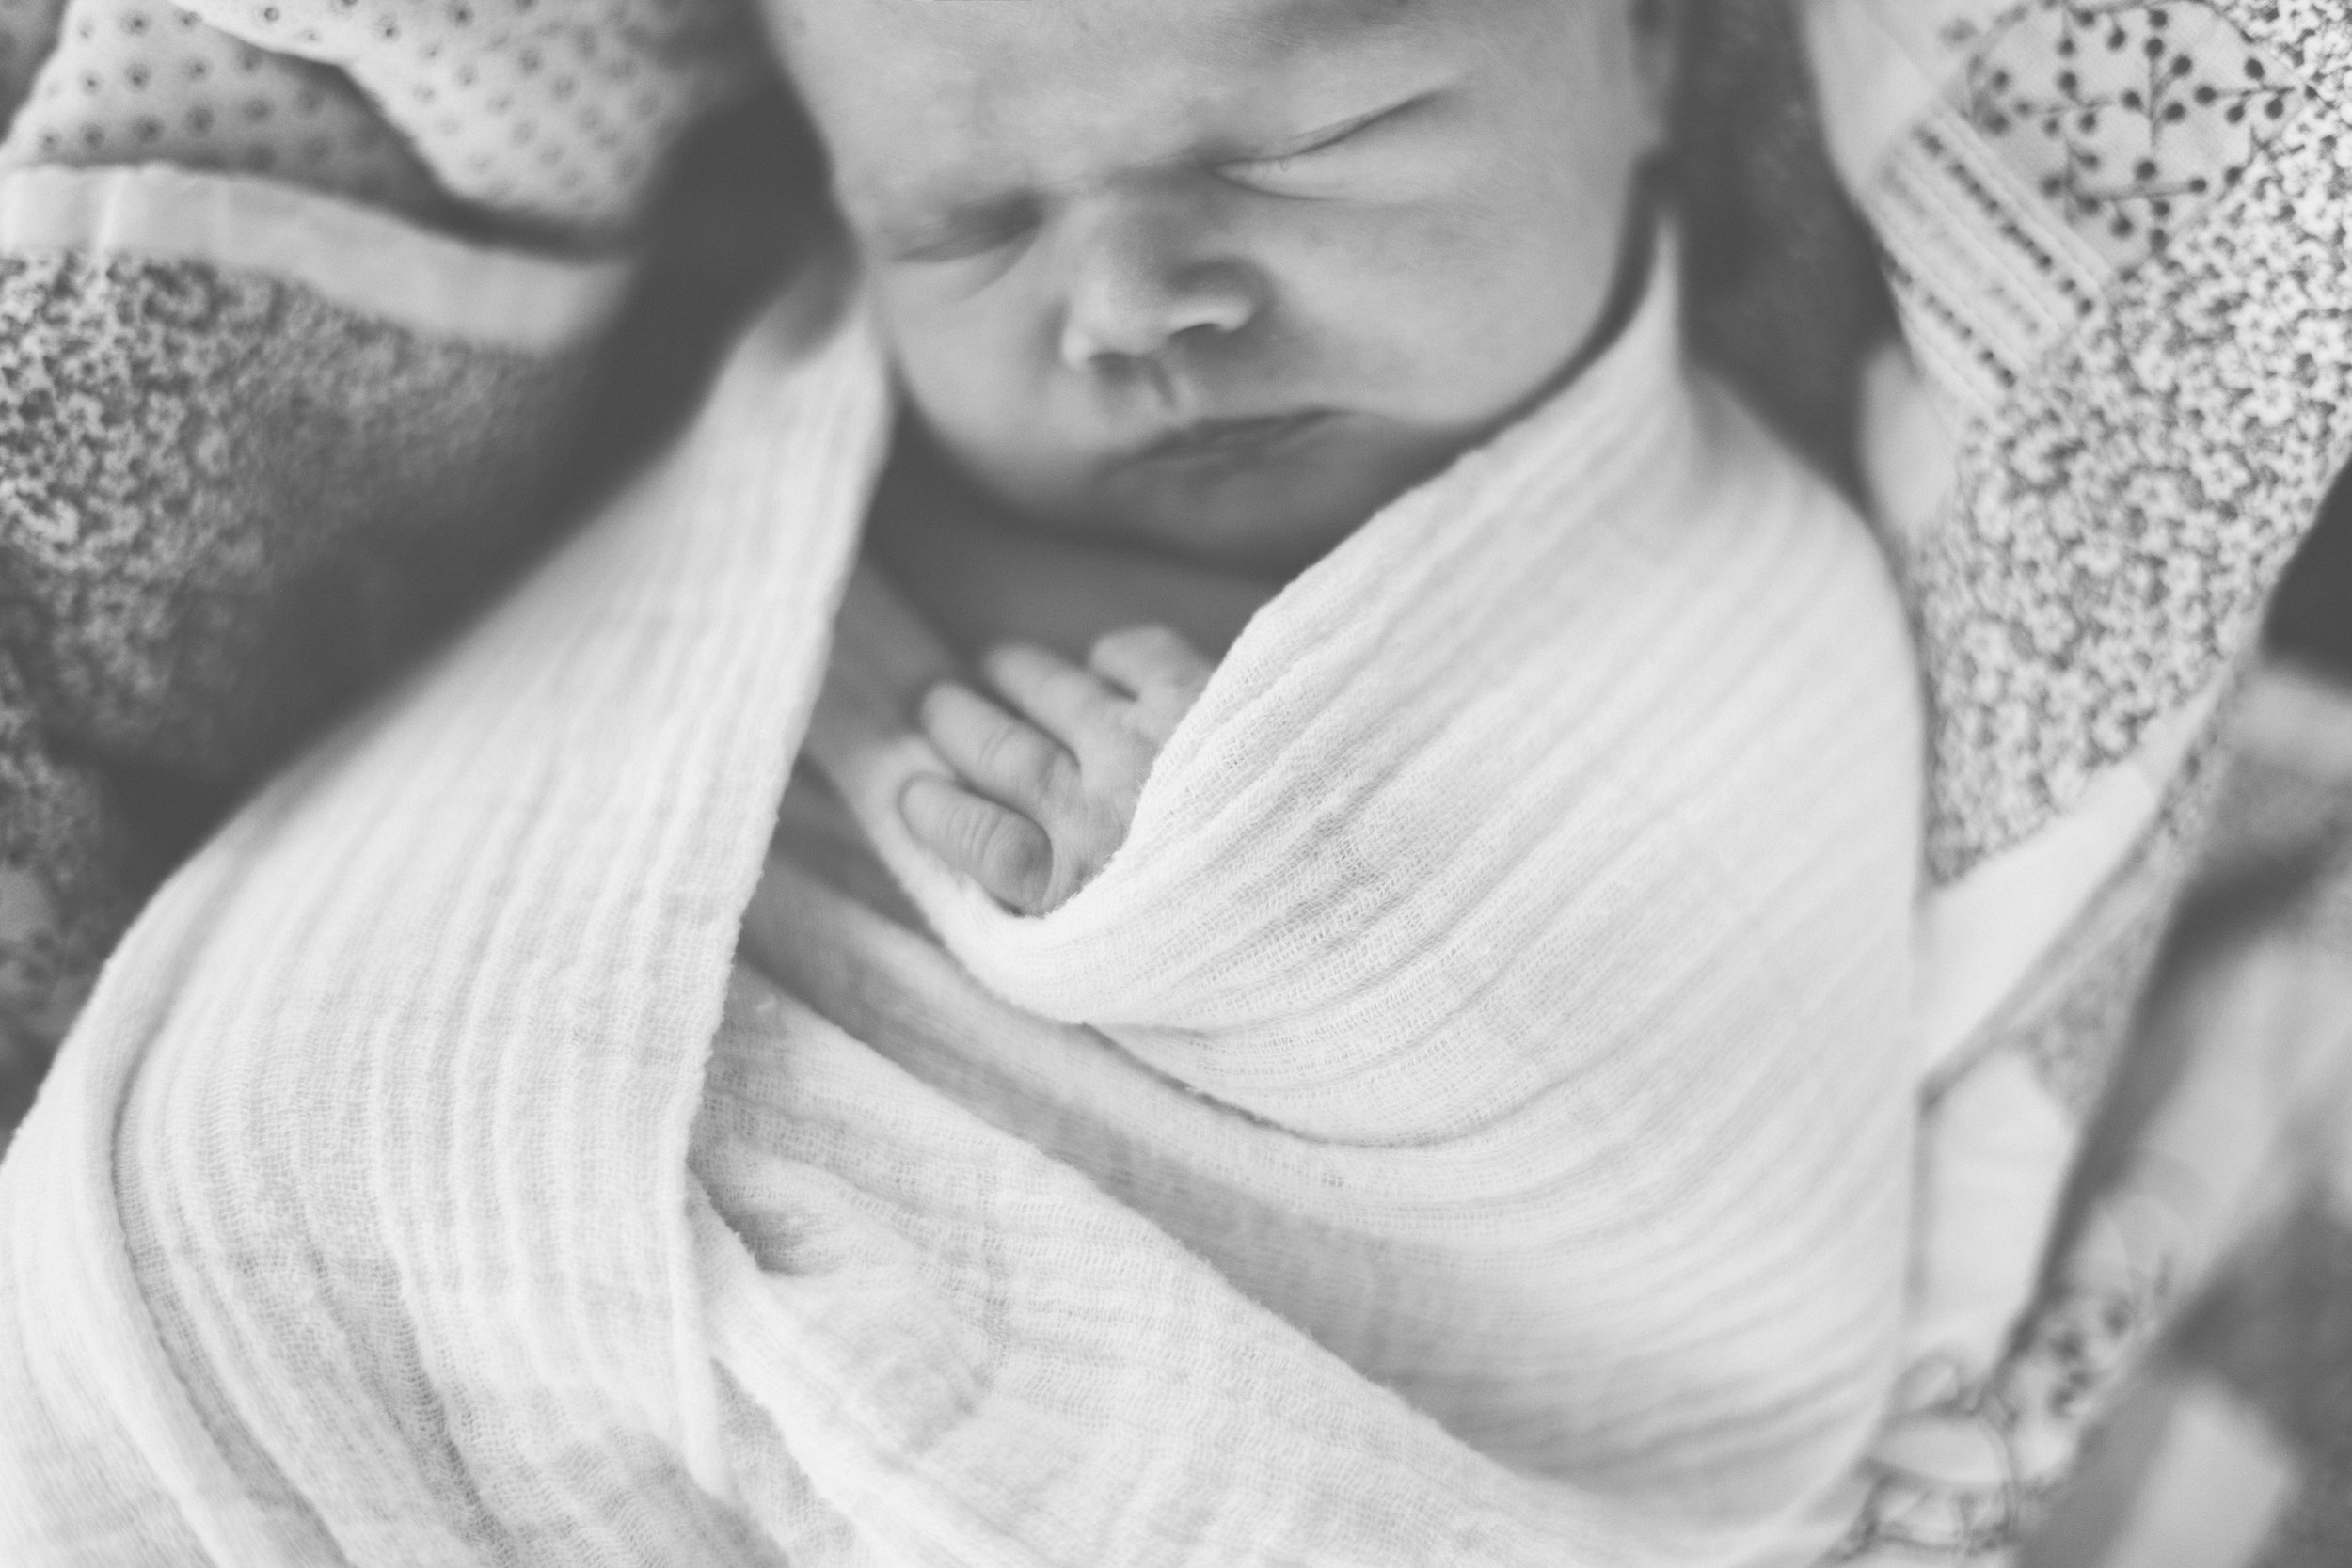 2017.08.17_BeauxHam_Newborn_preview-0026.jpg